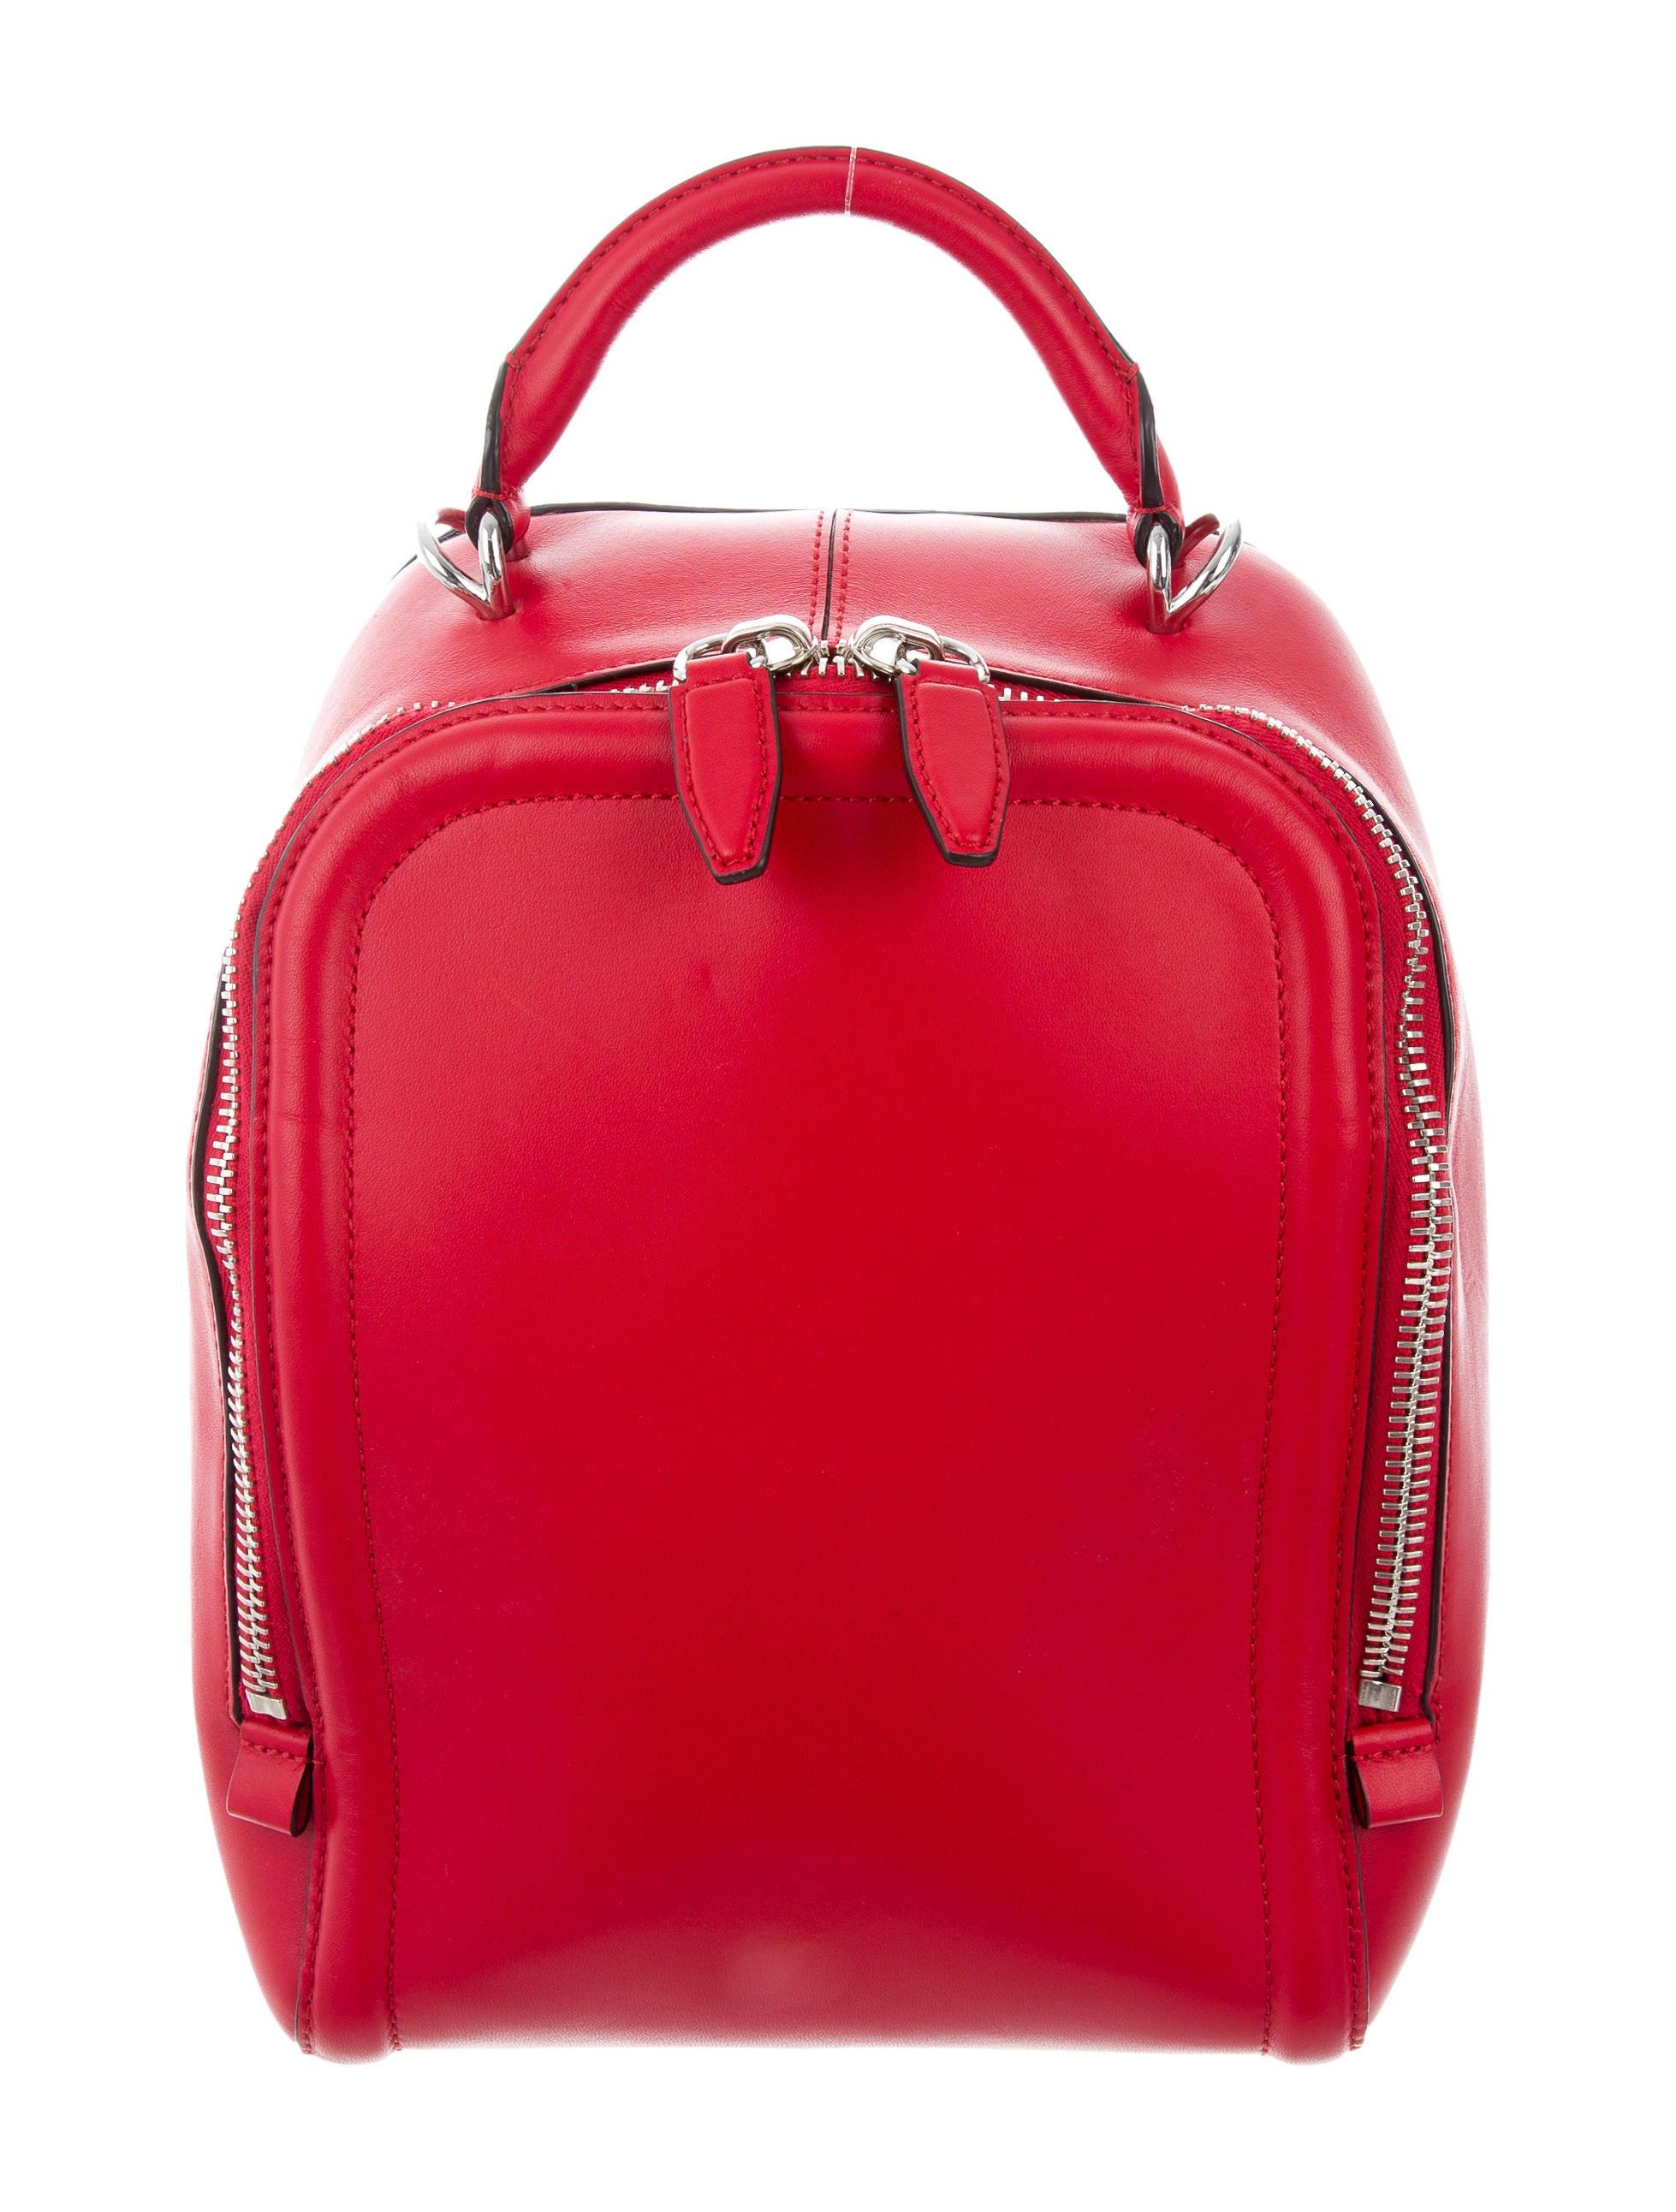 wang leather shoe bag handbags alx38711